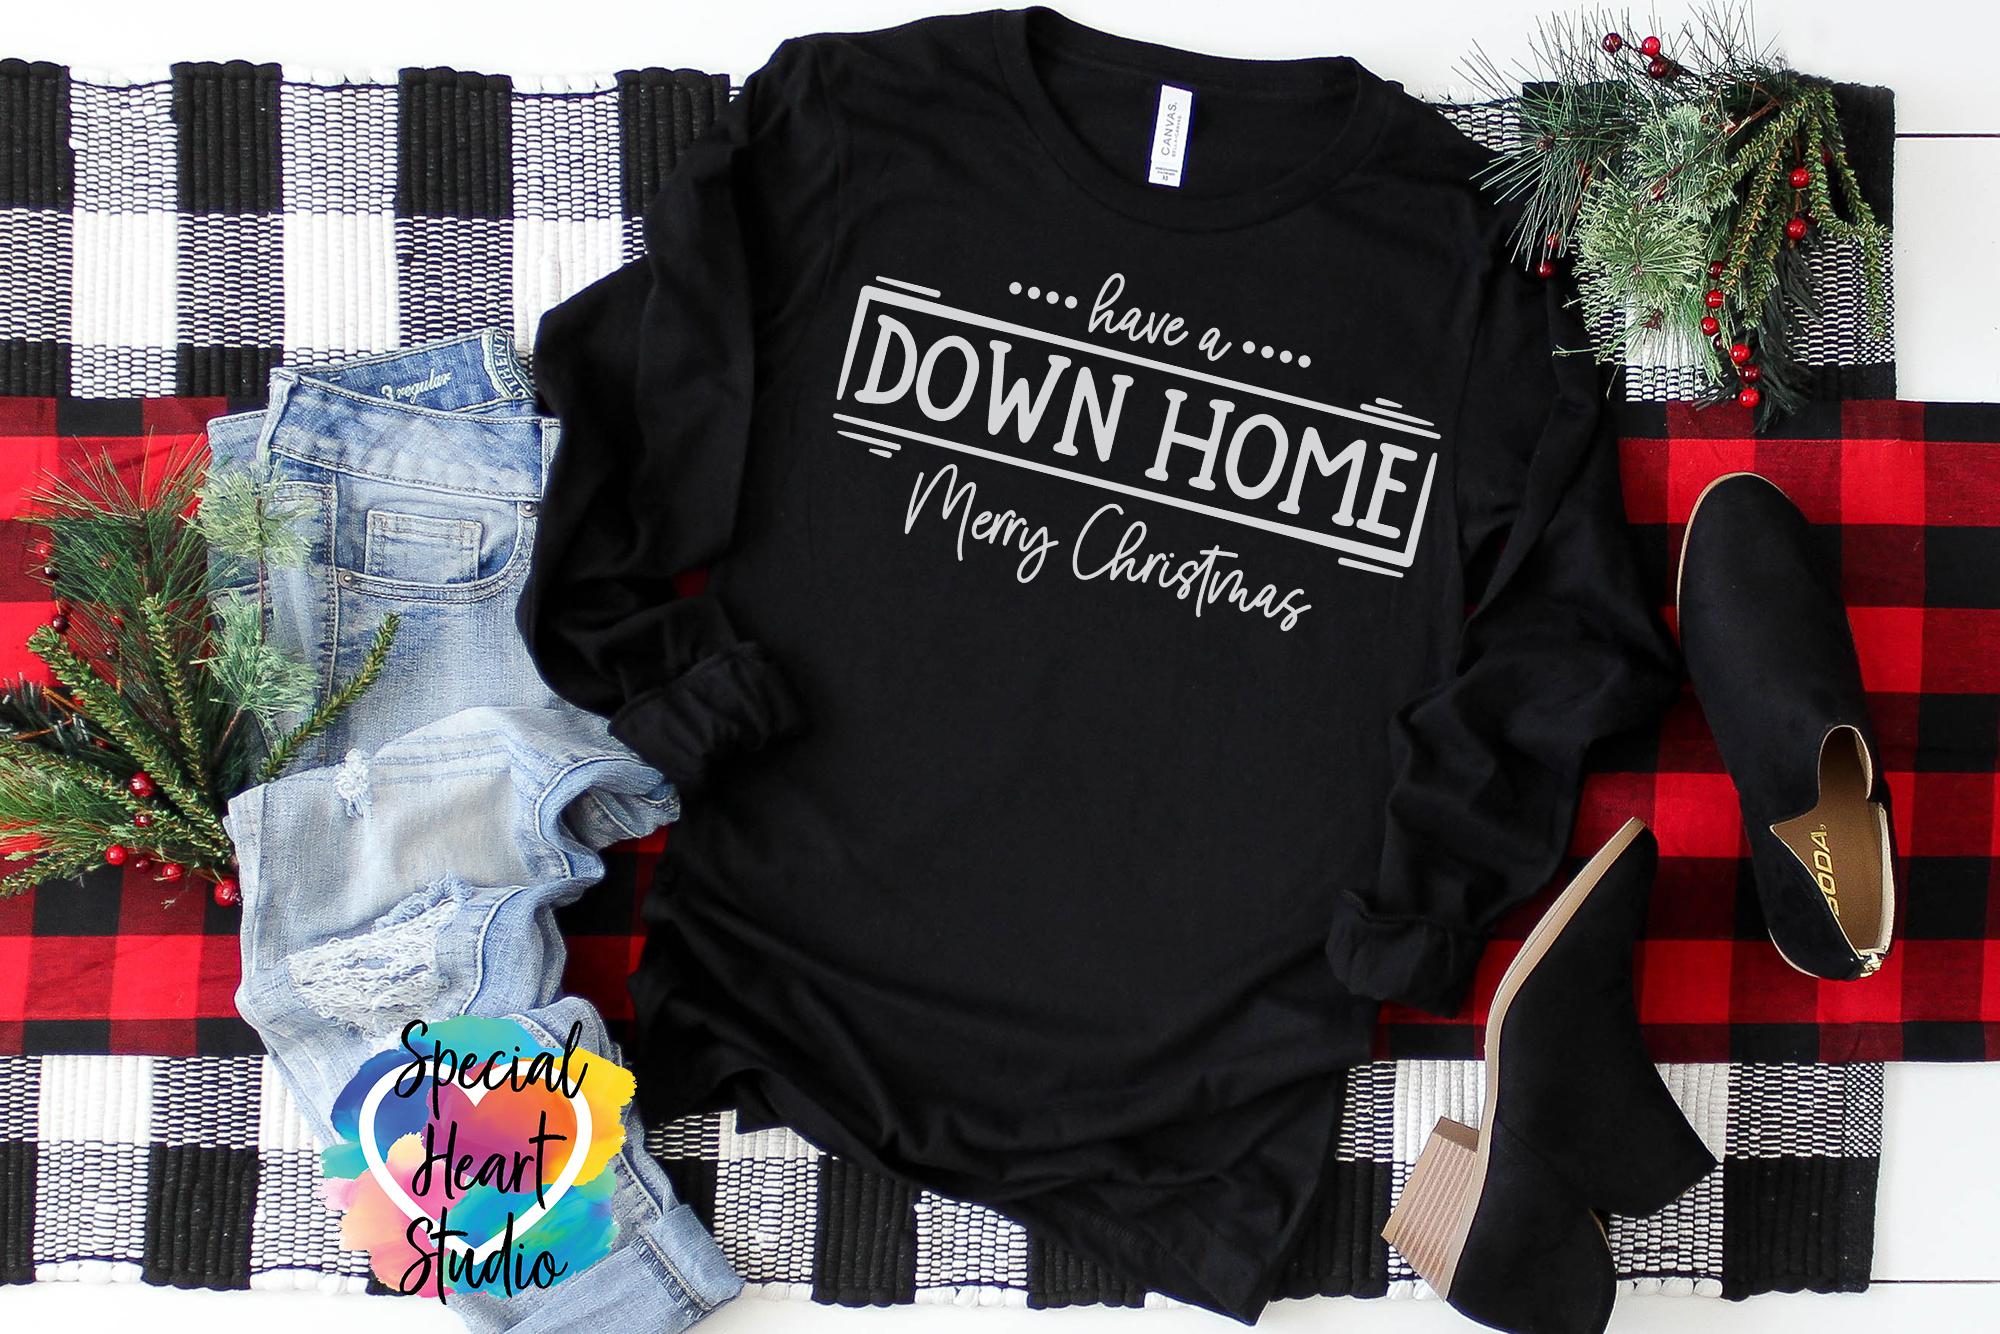 Down Home Christmas - A Christmas SVG Cut File example image 3